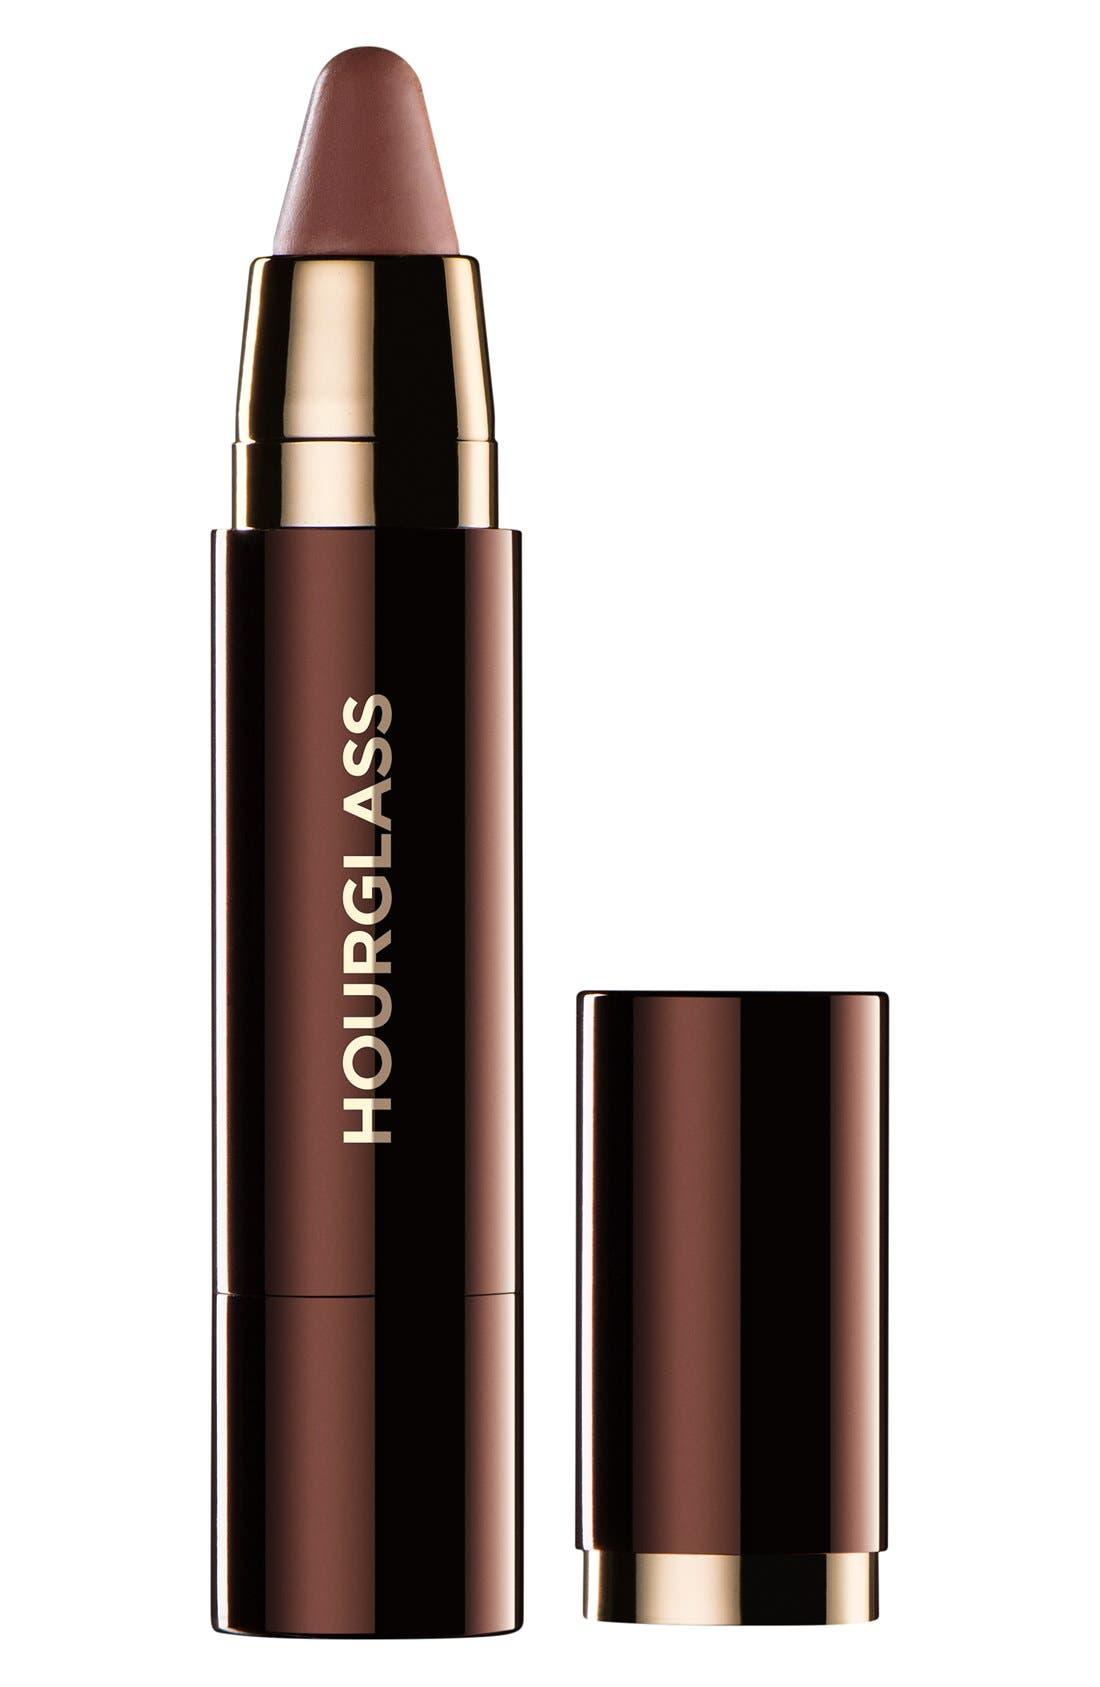 HOURGLASS Femme Nude Lip Stylo, Main, color, NO. 6 NUDE